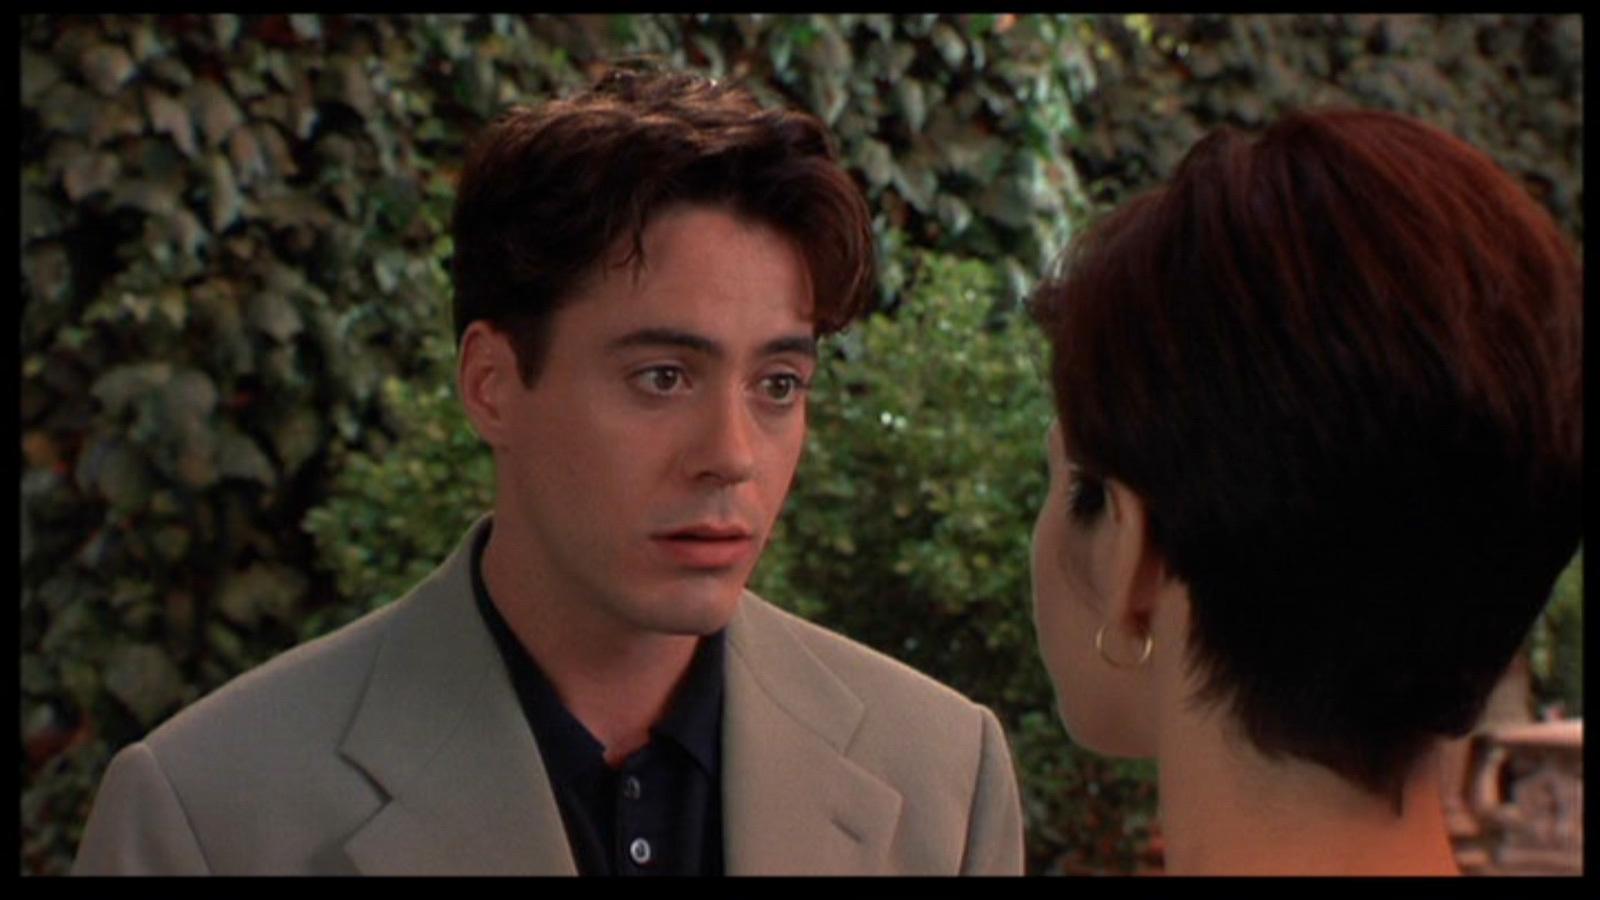 Robert Downey Jr. Robert in 'Only You' Robert Downey